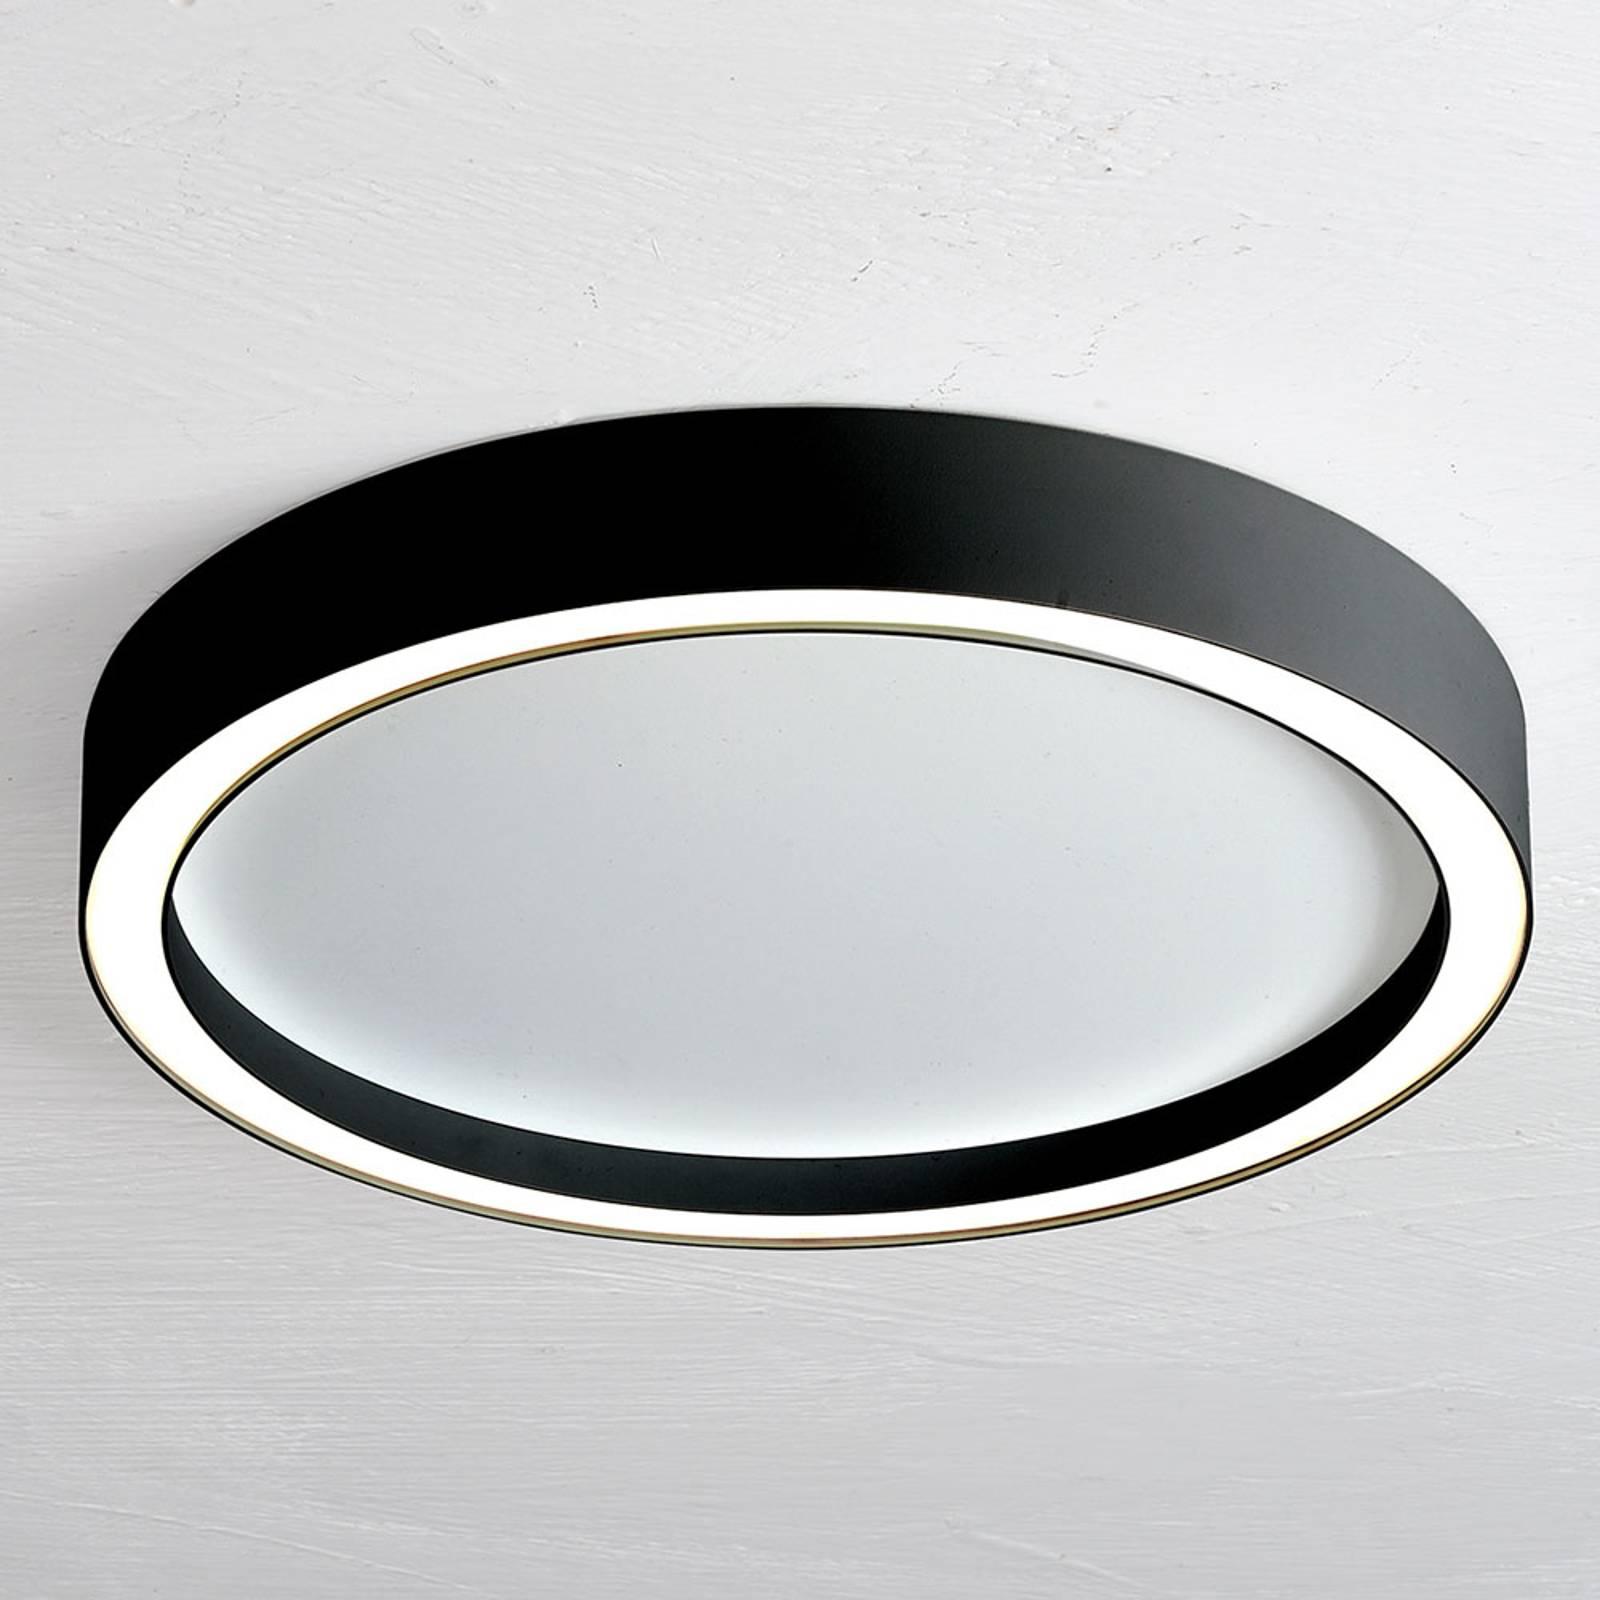 Bopp Aura LED-kattovalaisin Ø 55 cm musta